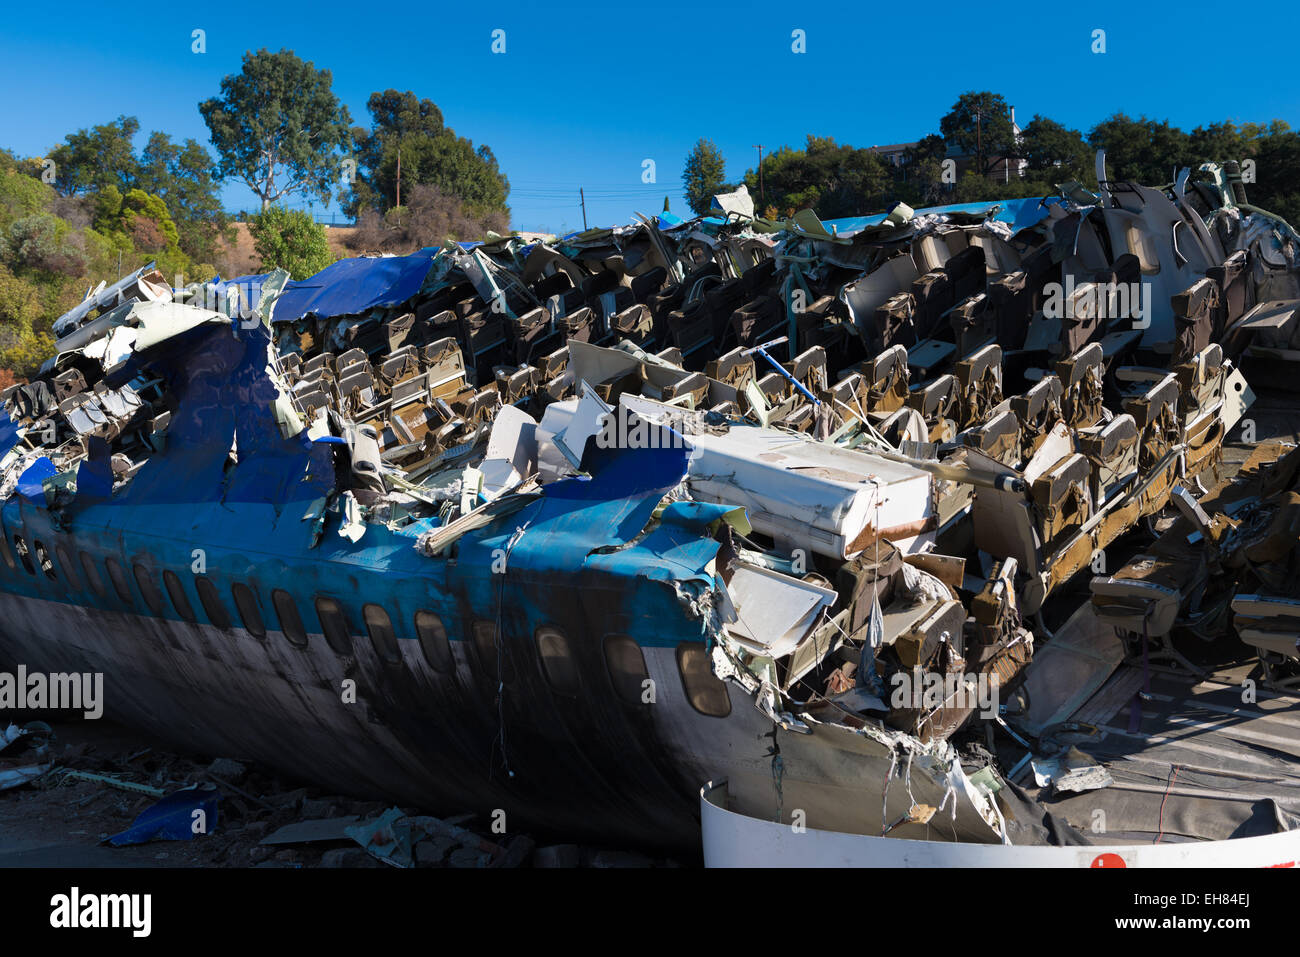 war of the worlds movie plane crash site in universal